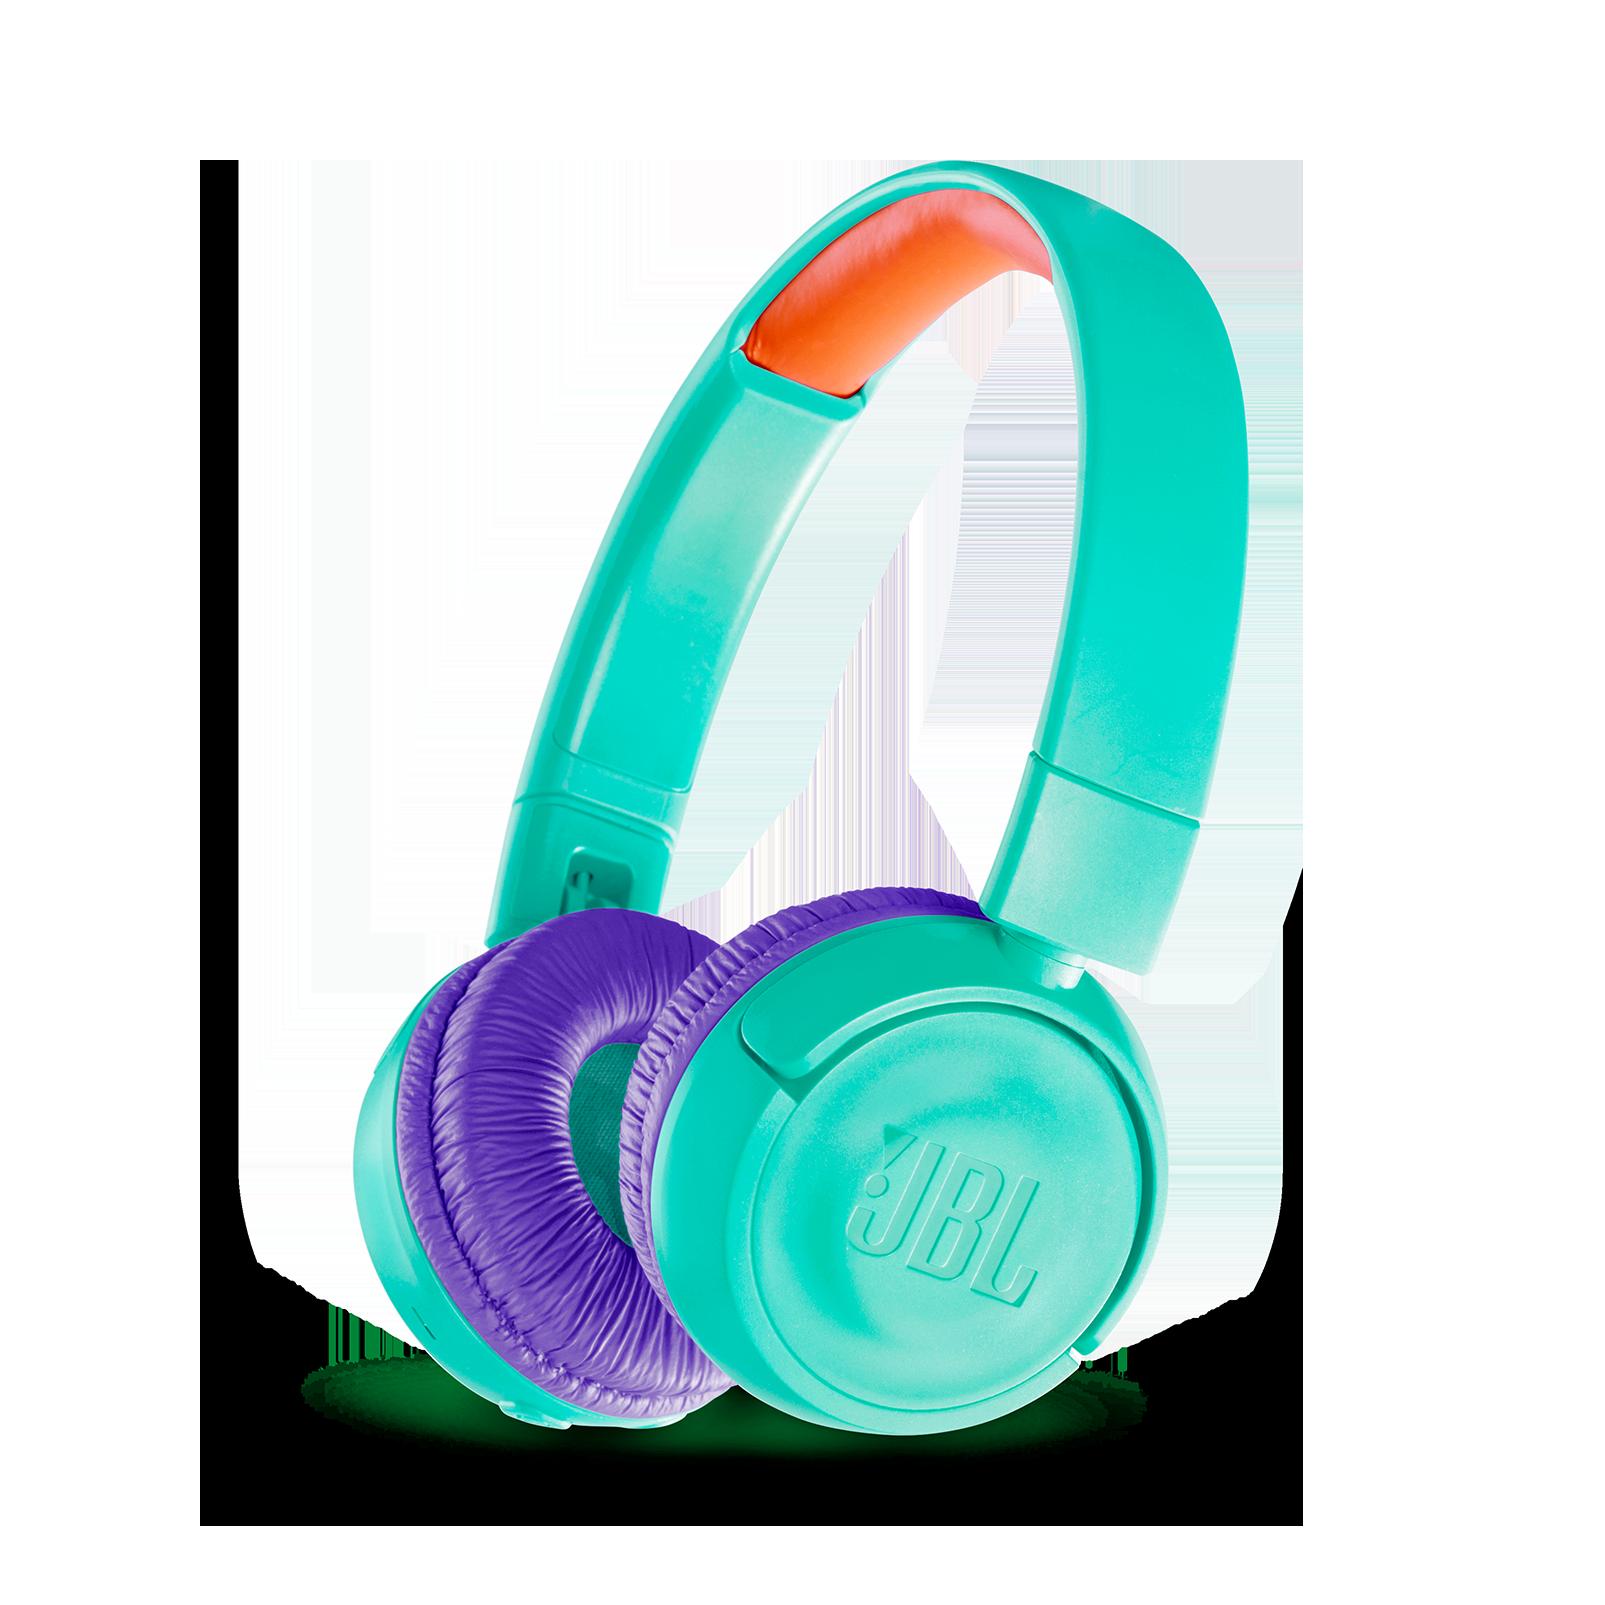 JBL JR300BT - Tropic Teal - Kids Wireless on-ear headphones - Hero